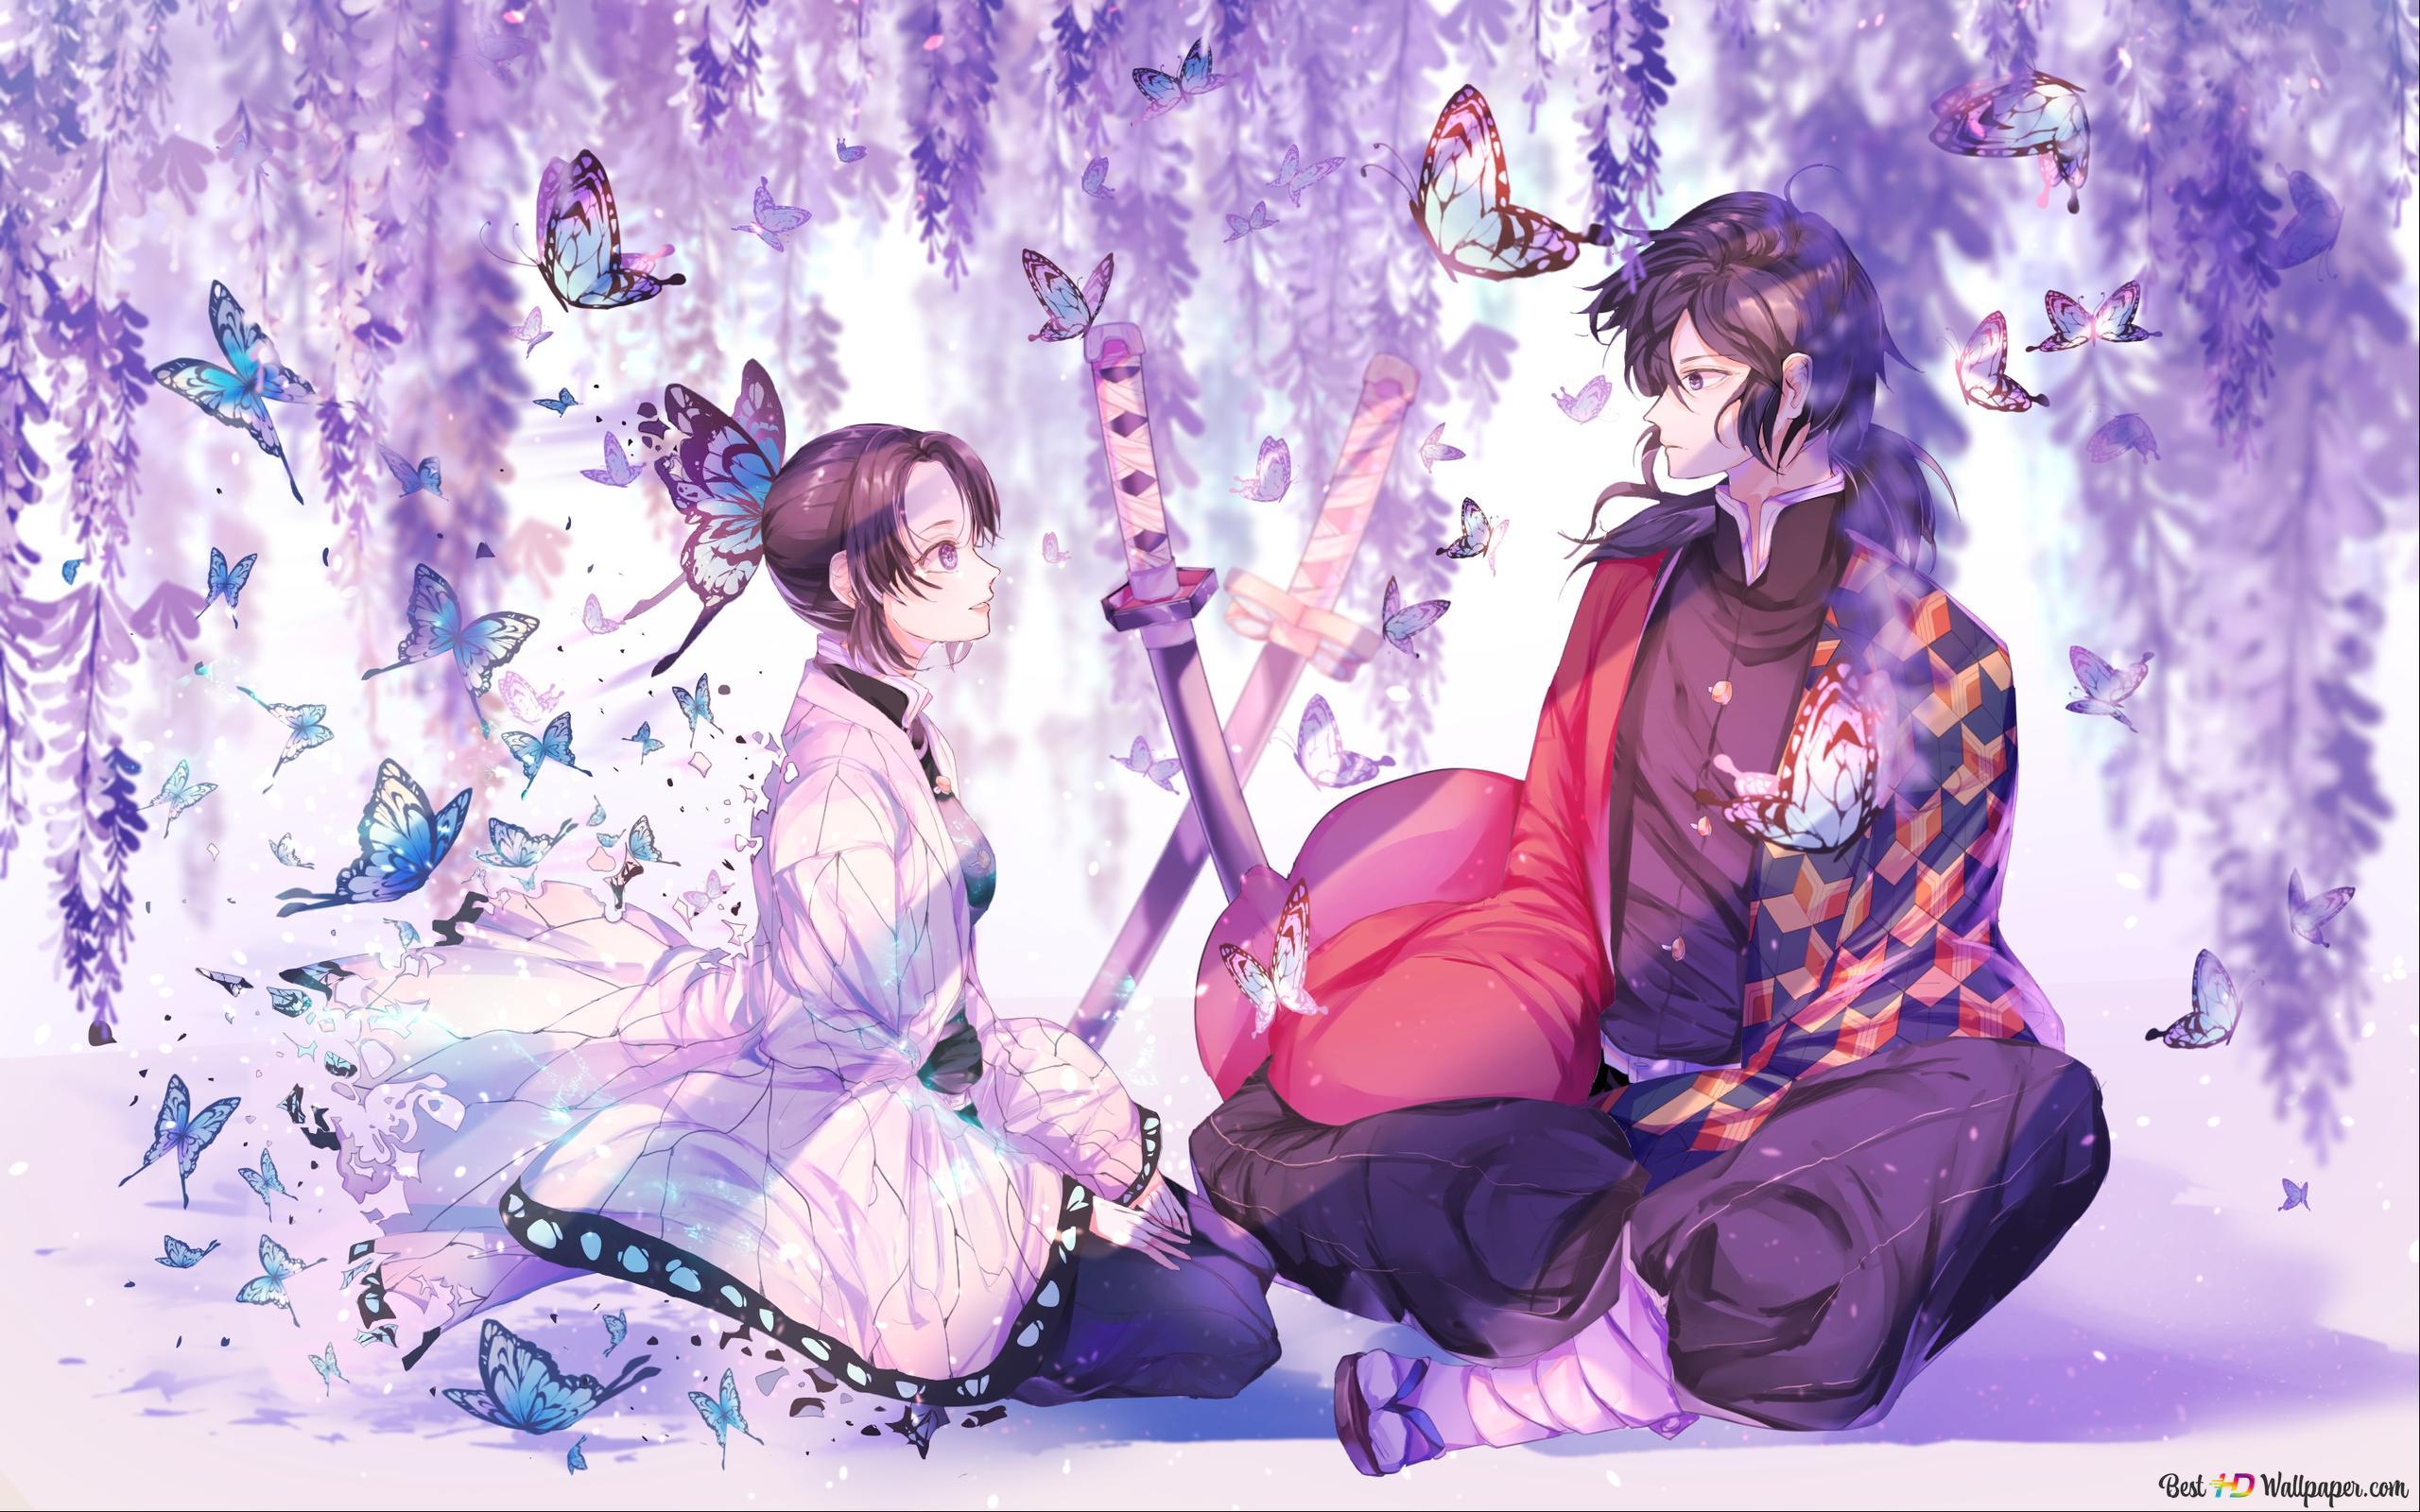 hashira s shinobu and giyu with purple wisteria and butterflies background wallpaper 2560x1600 42571 7